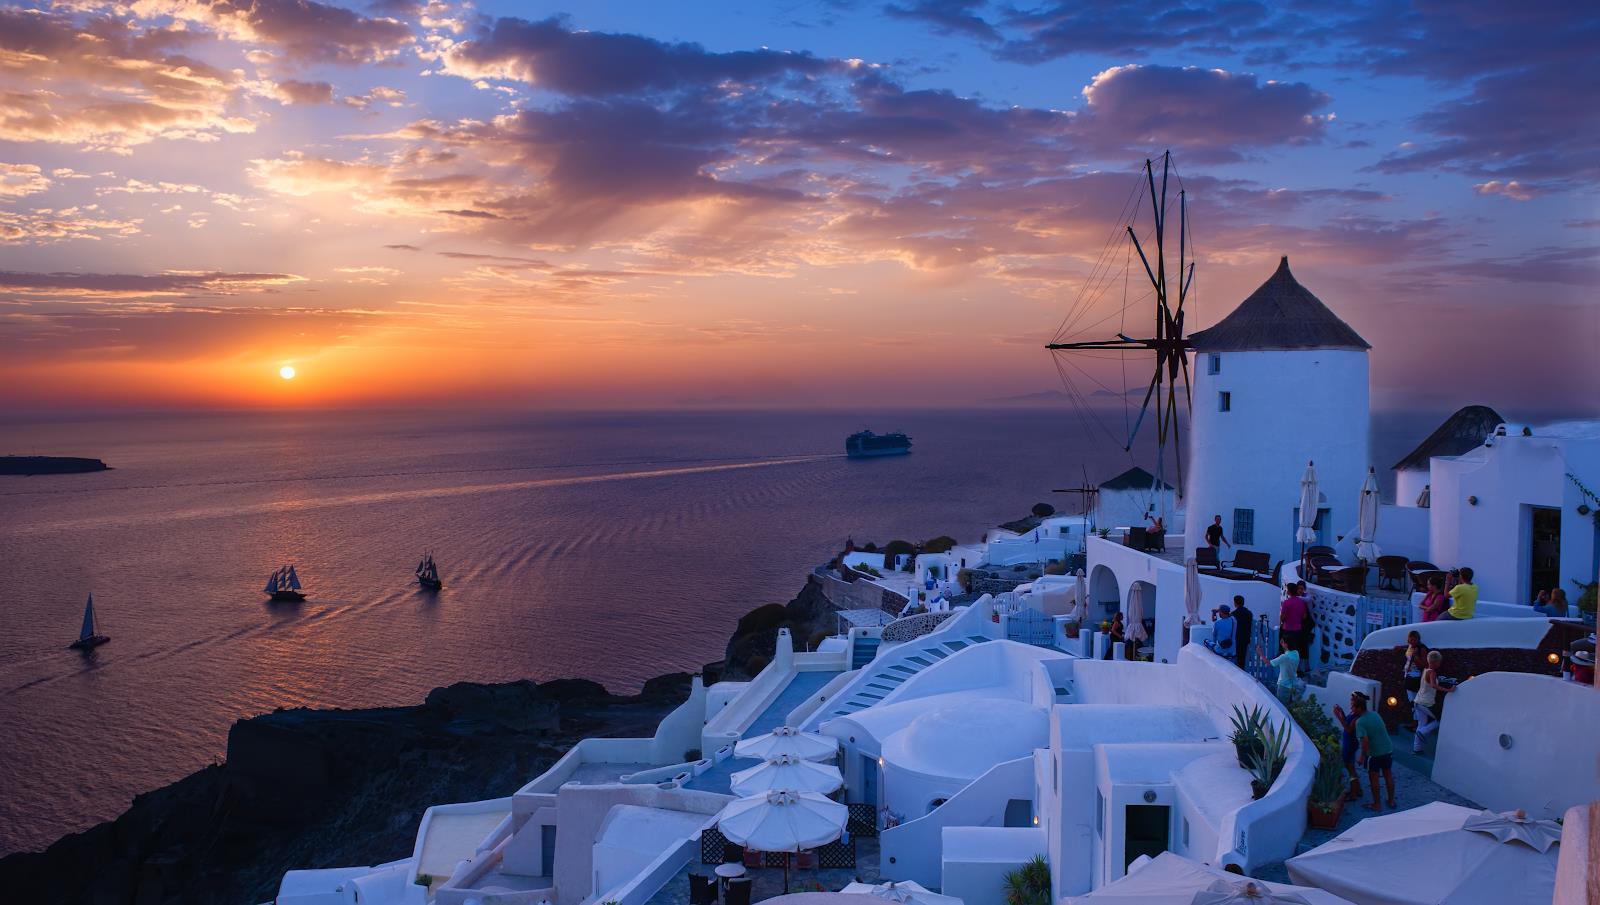 Туры в Грецию из Алматы. Путевки в Грецию. Отдых в Греции